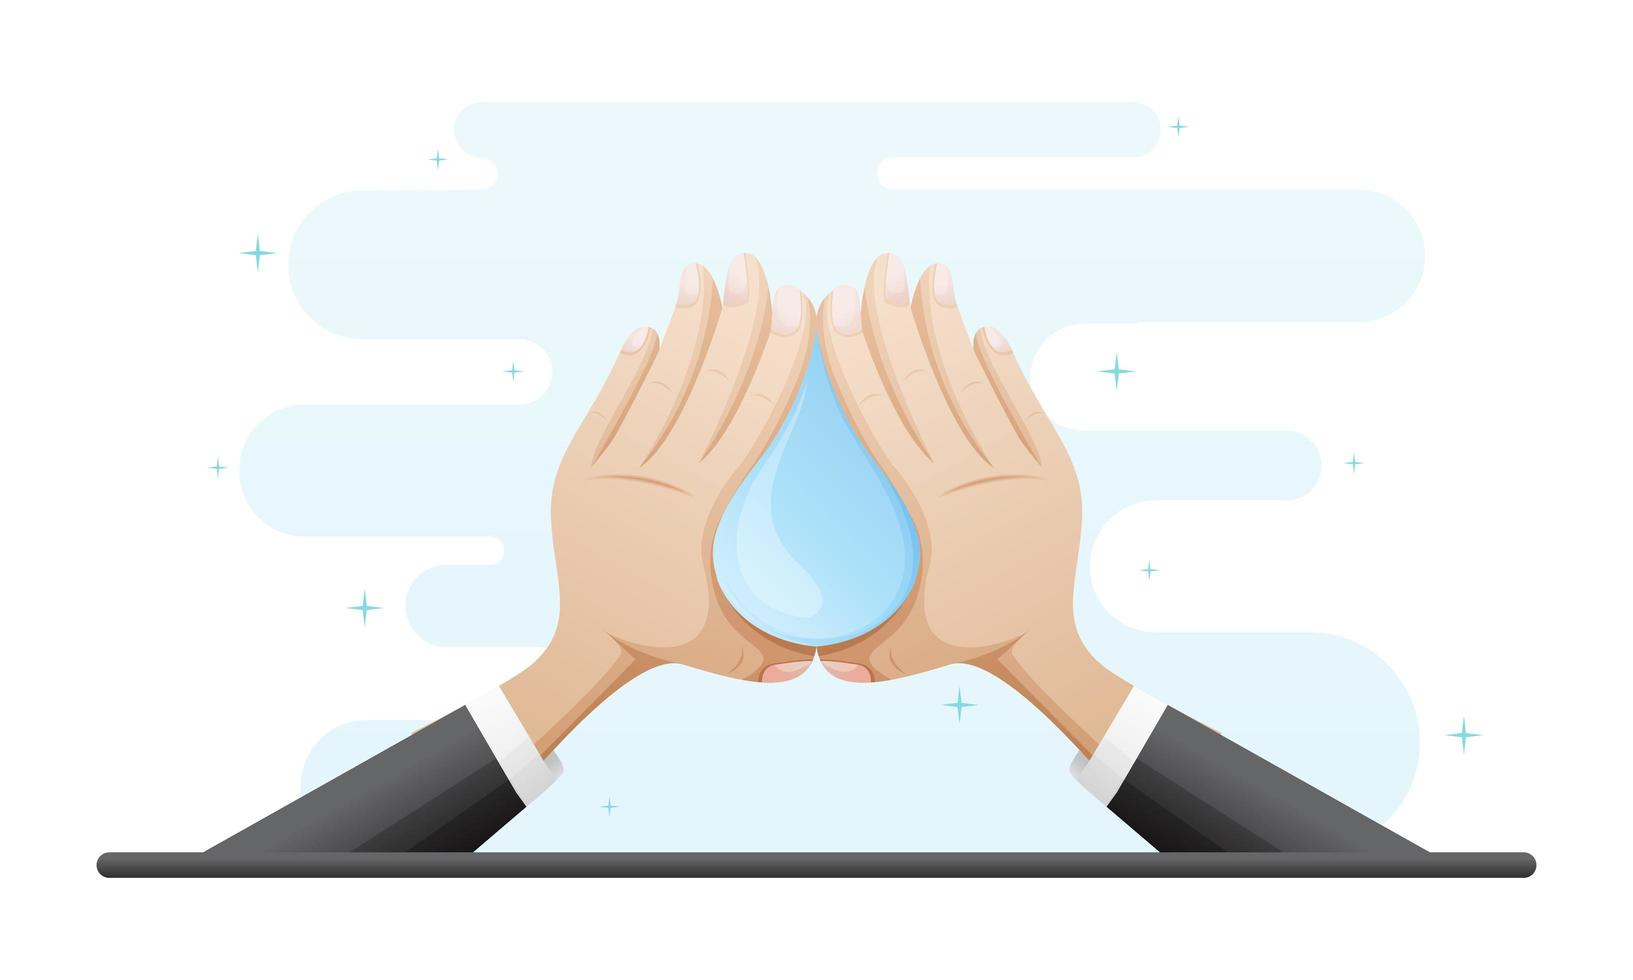 Washing Hands Concept Illustration vector